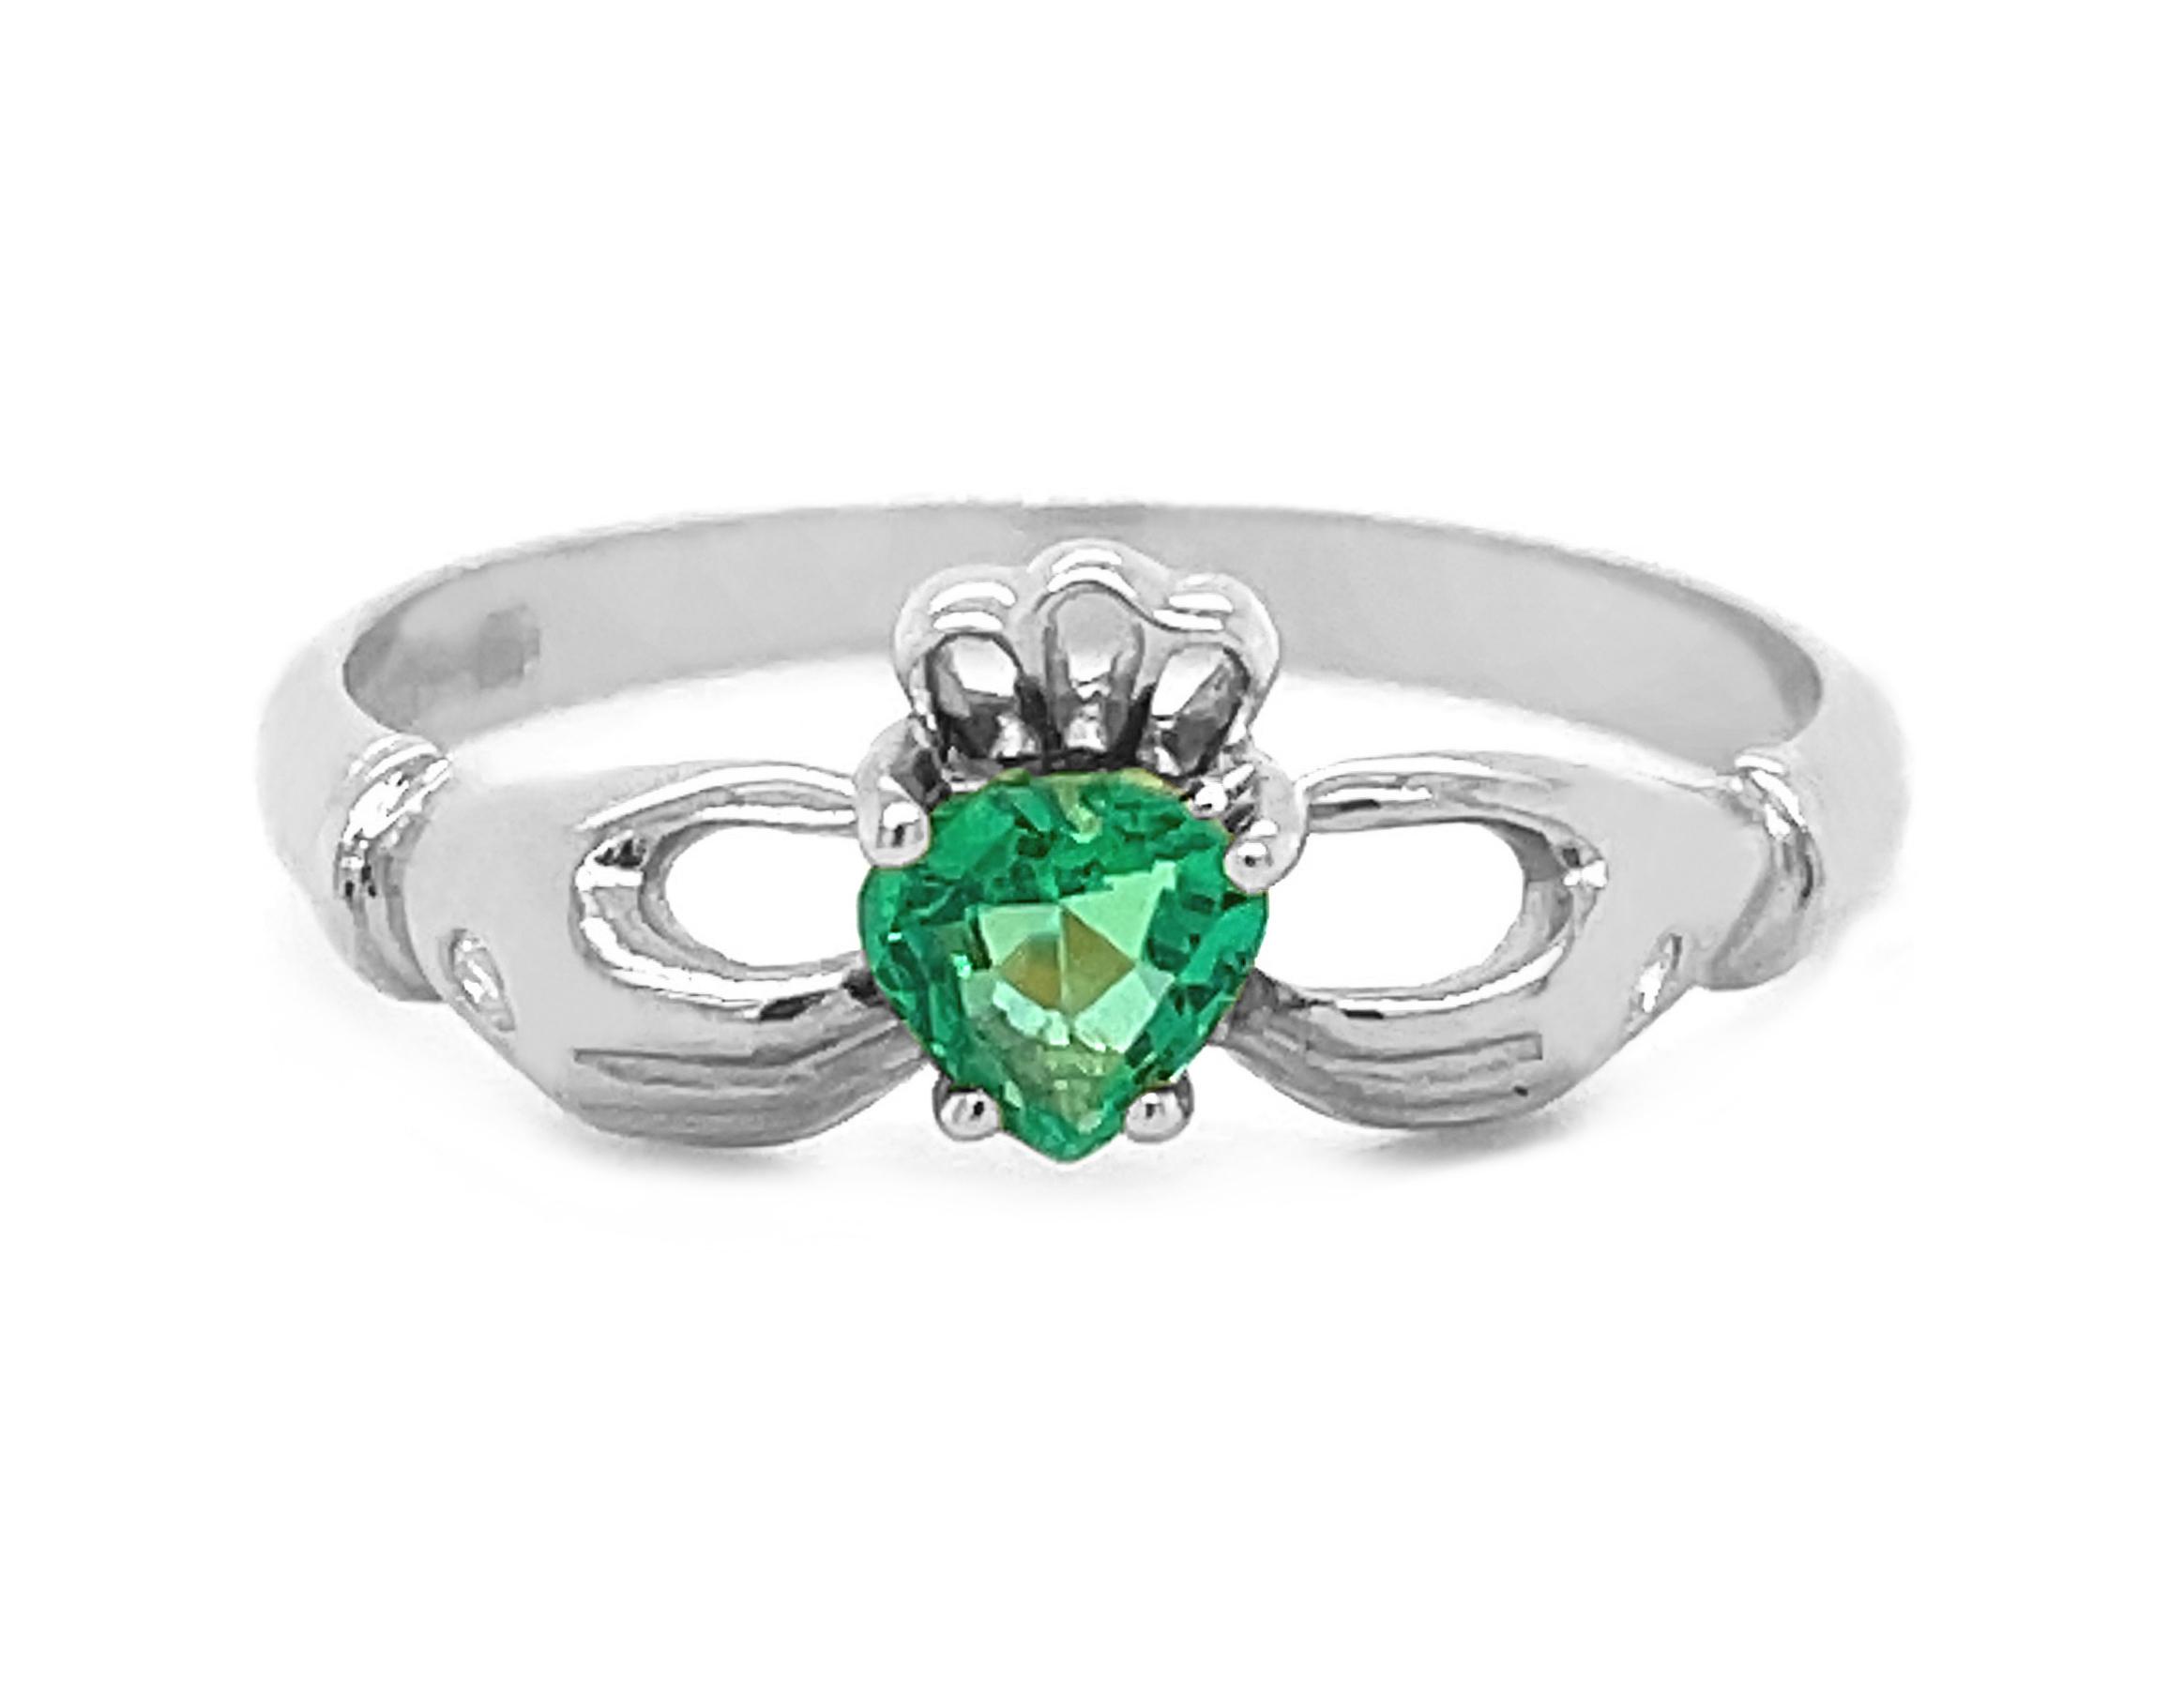 Emerald & Diamond Claddagh Ring